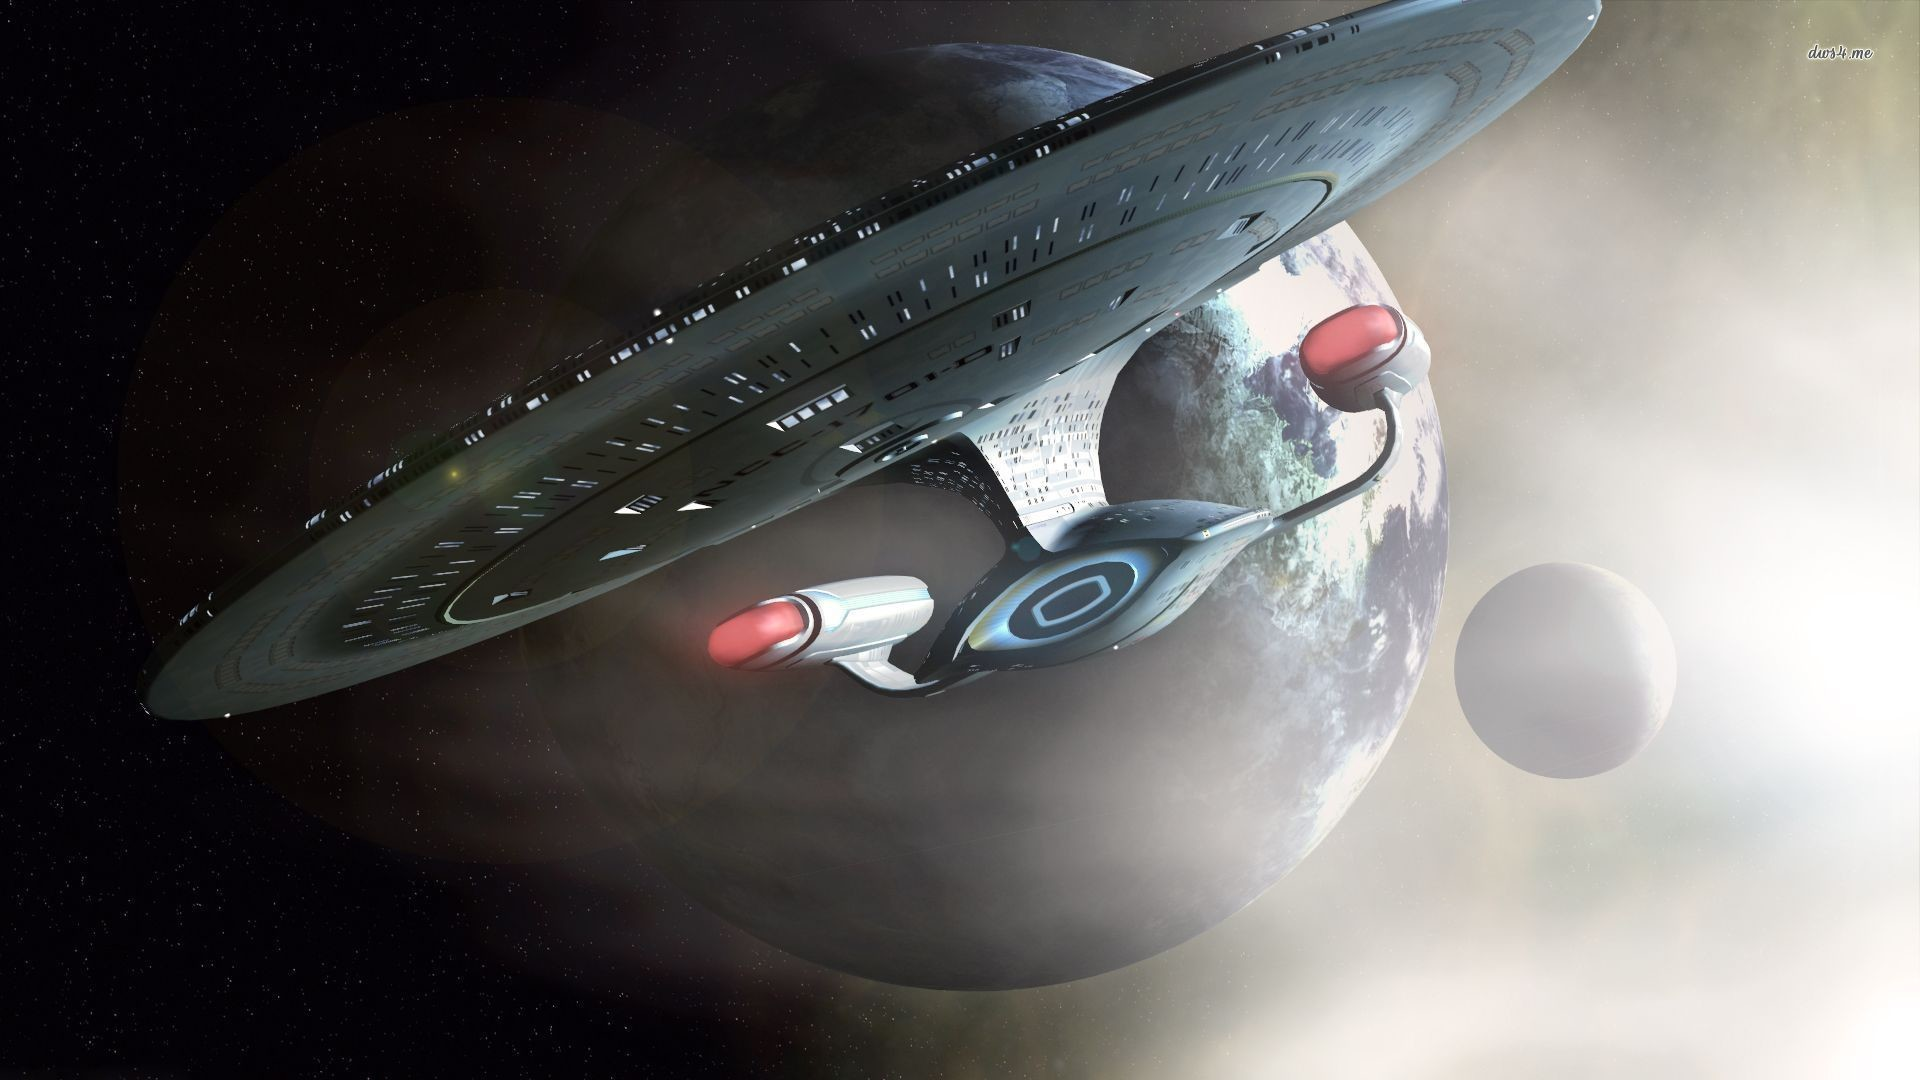 … Star Trek Wallpaper …